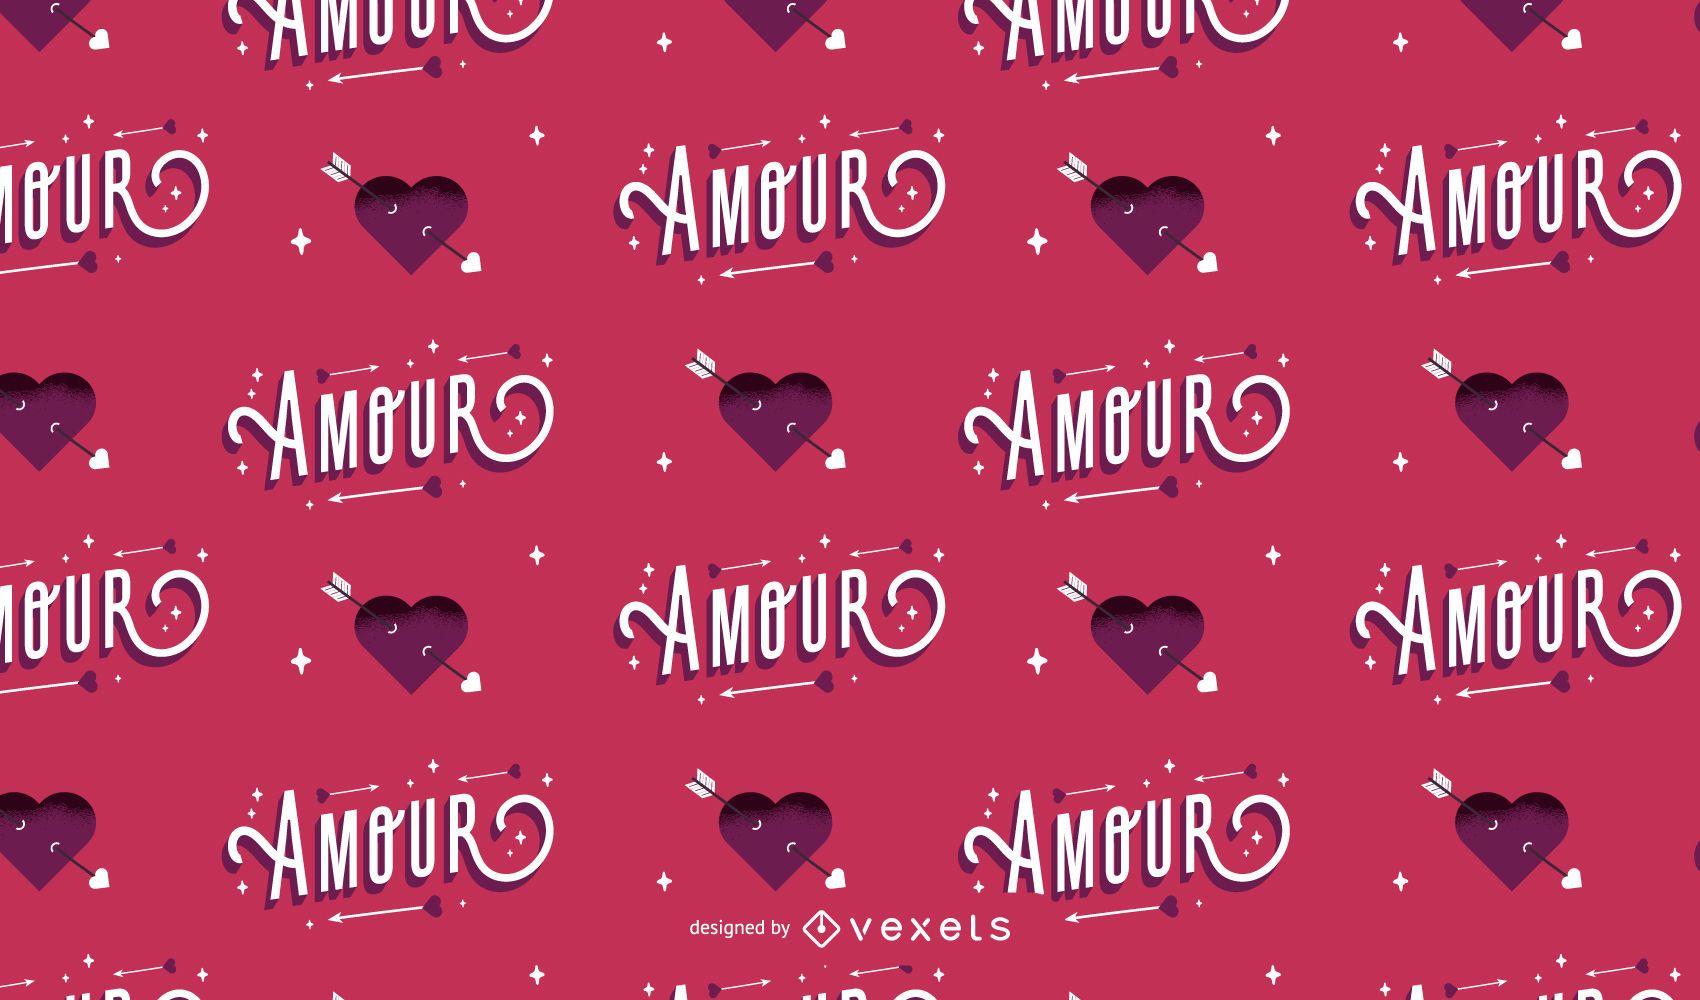 Diseño de patrón de amour de San Valentín